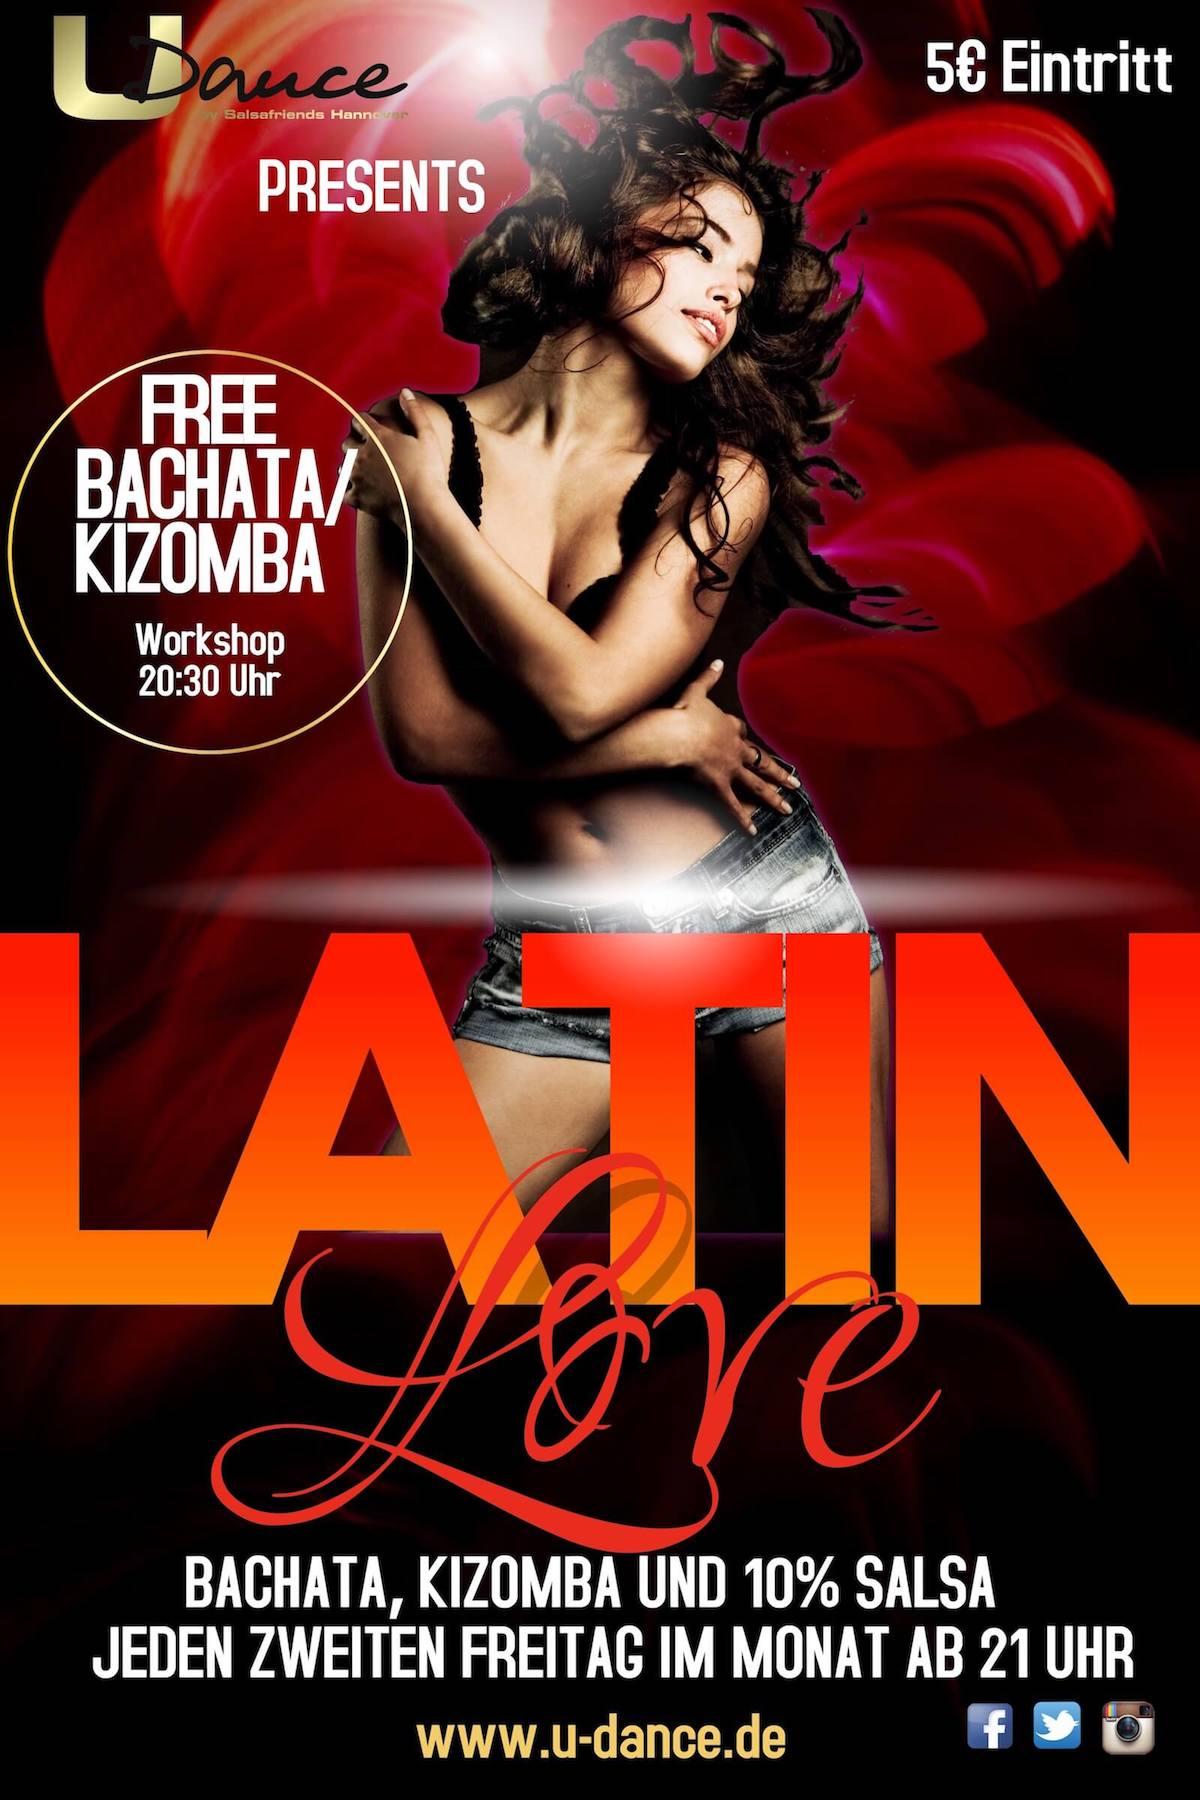 Latin Love Party mit Kizomba Bachata & Salsa in Hannover